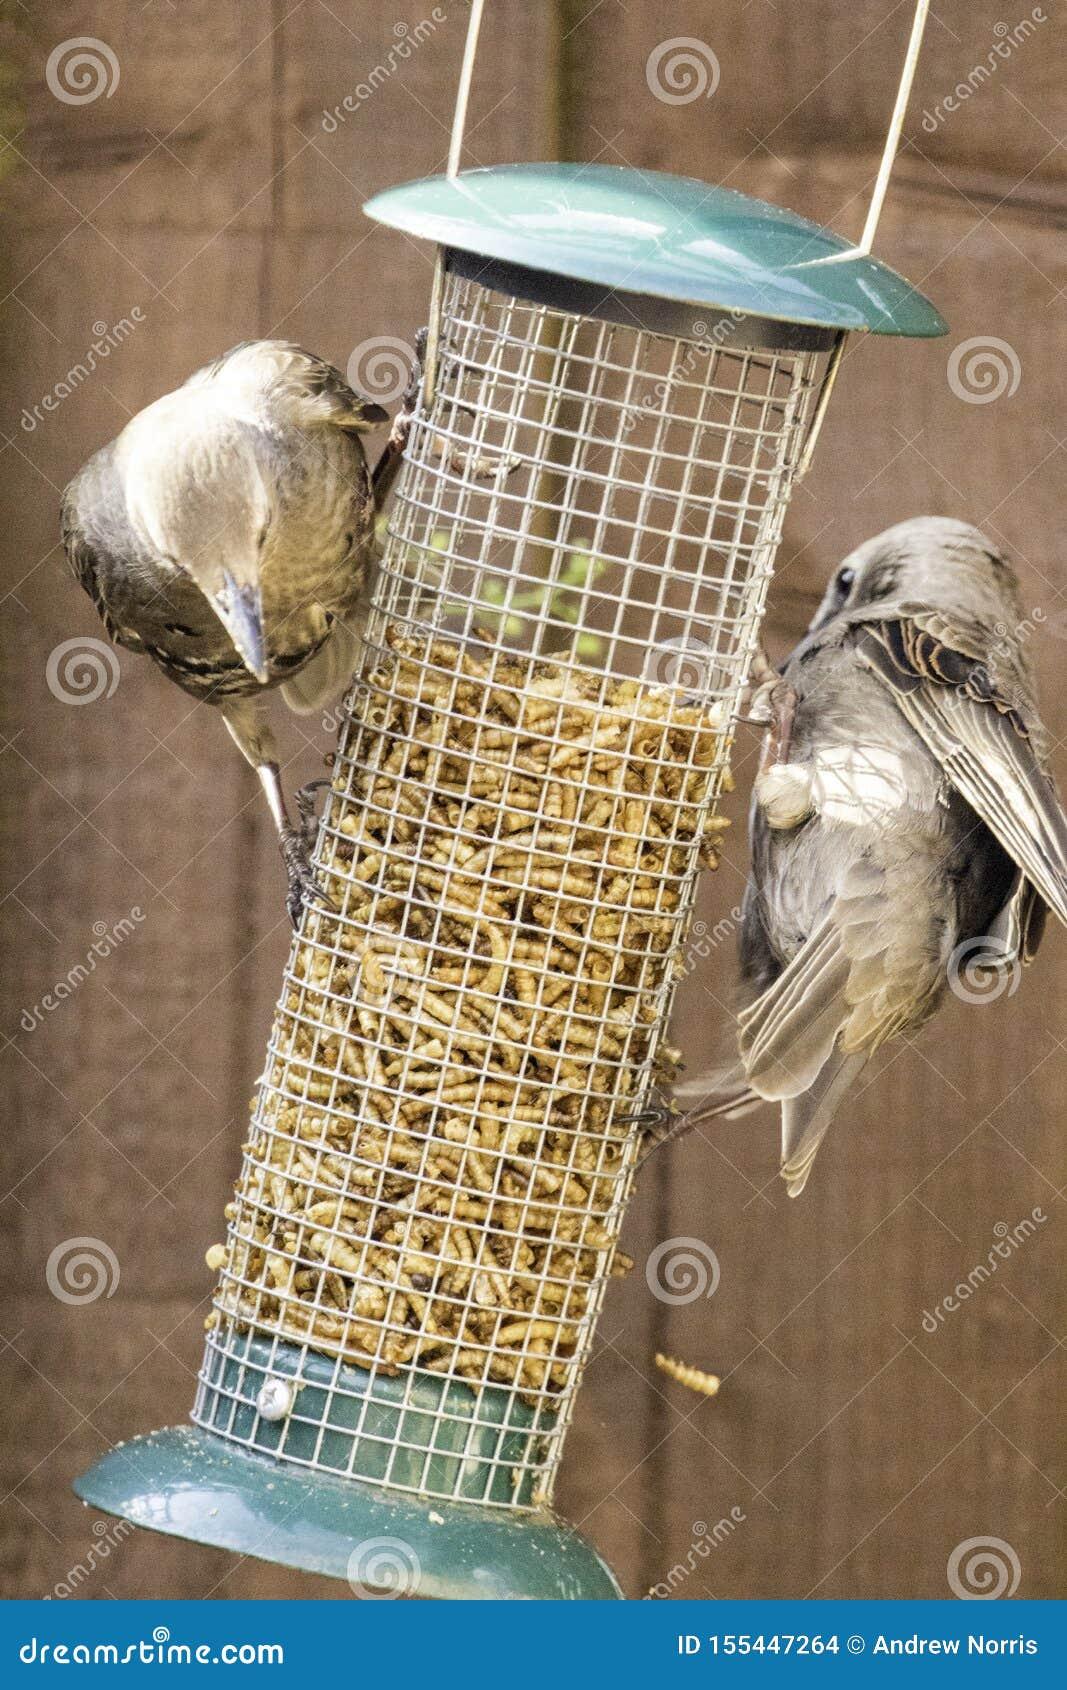 Starling Bird Feeder Meal